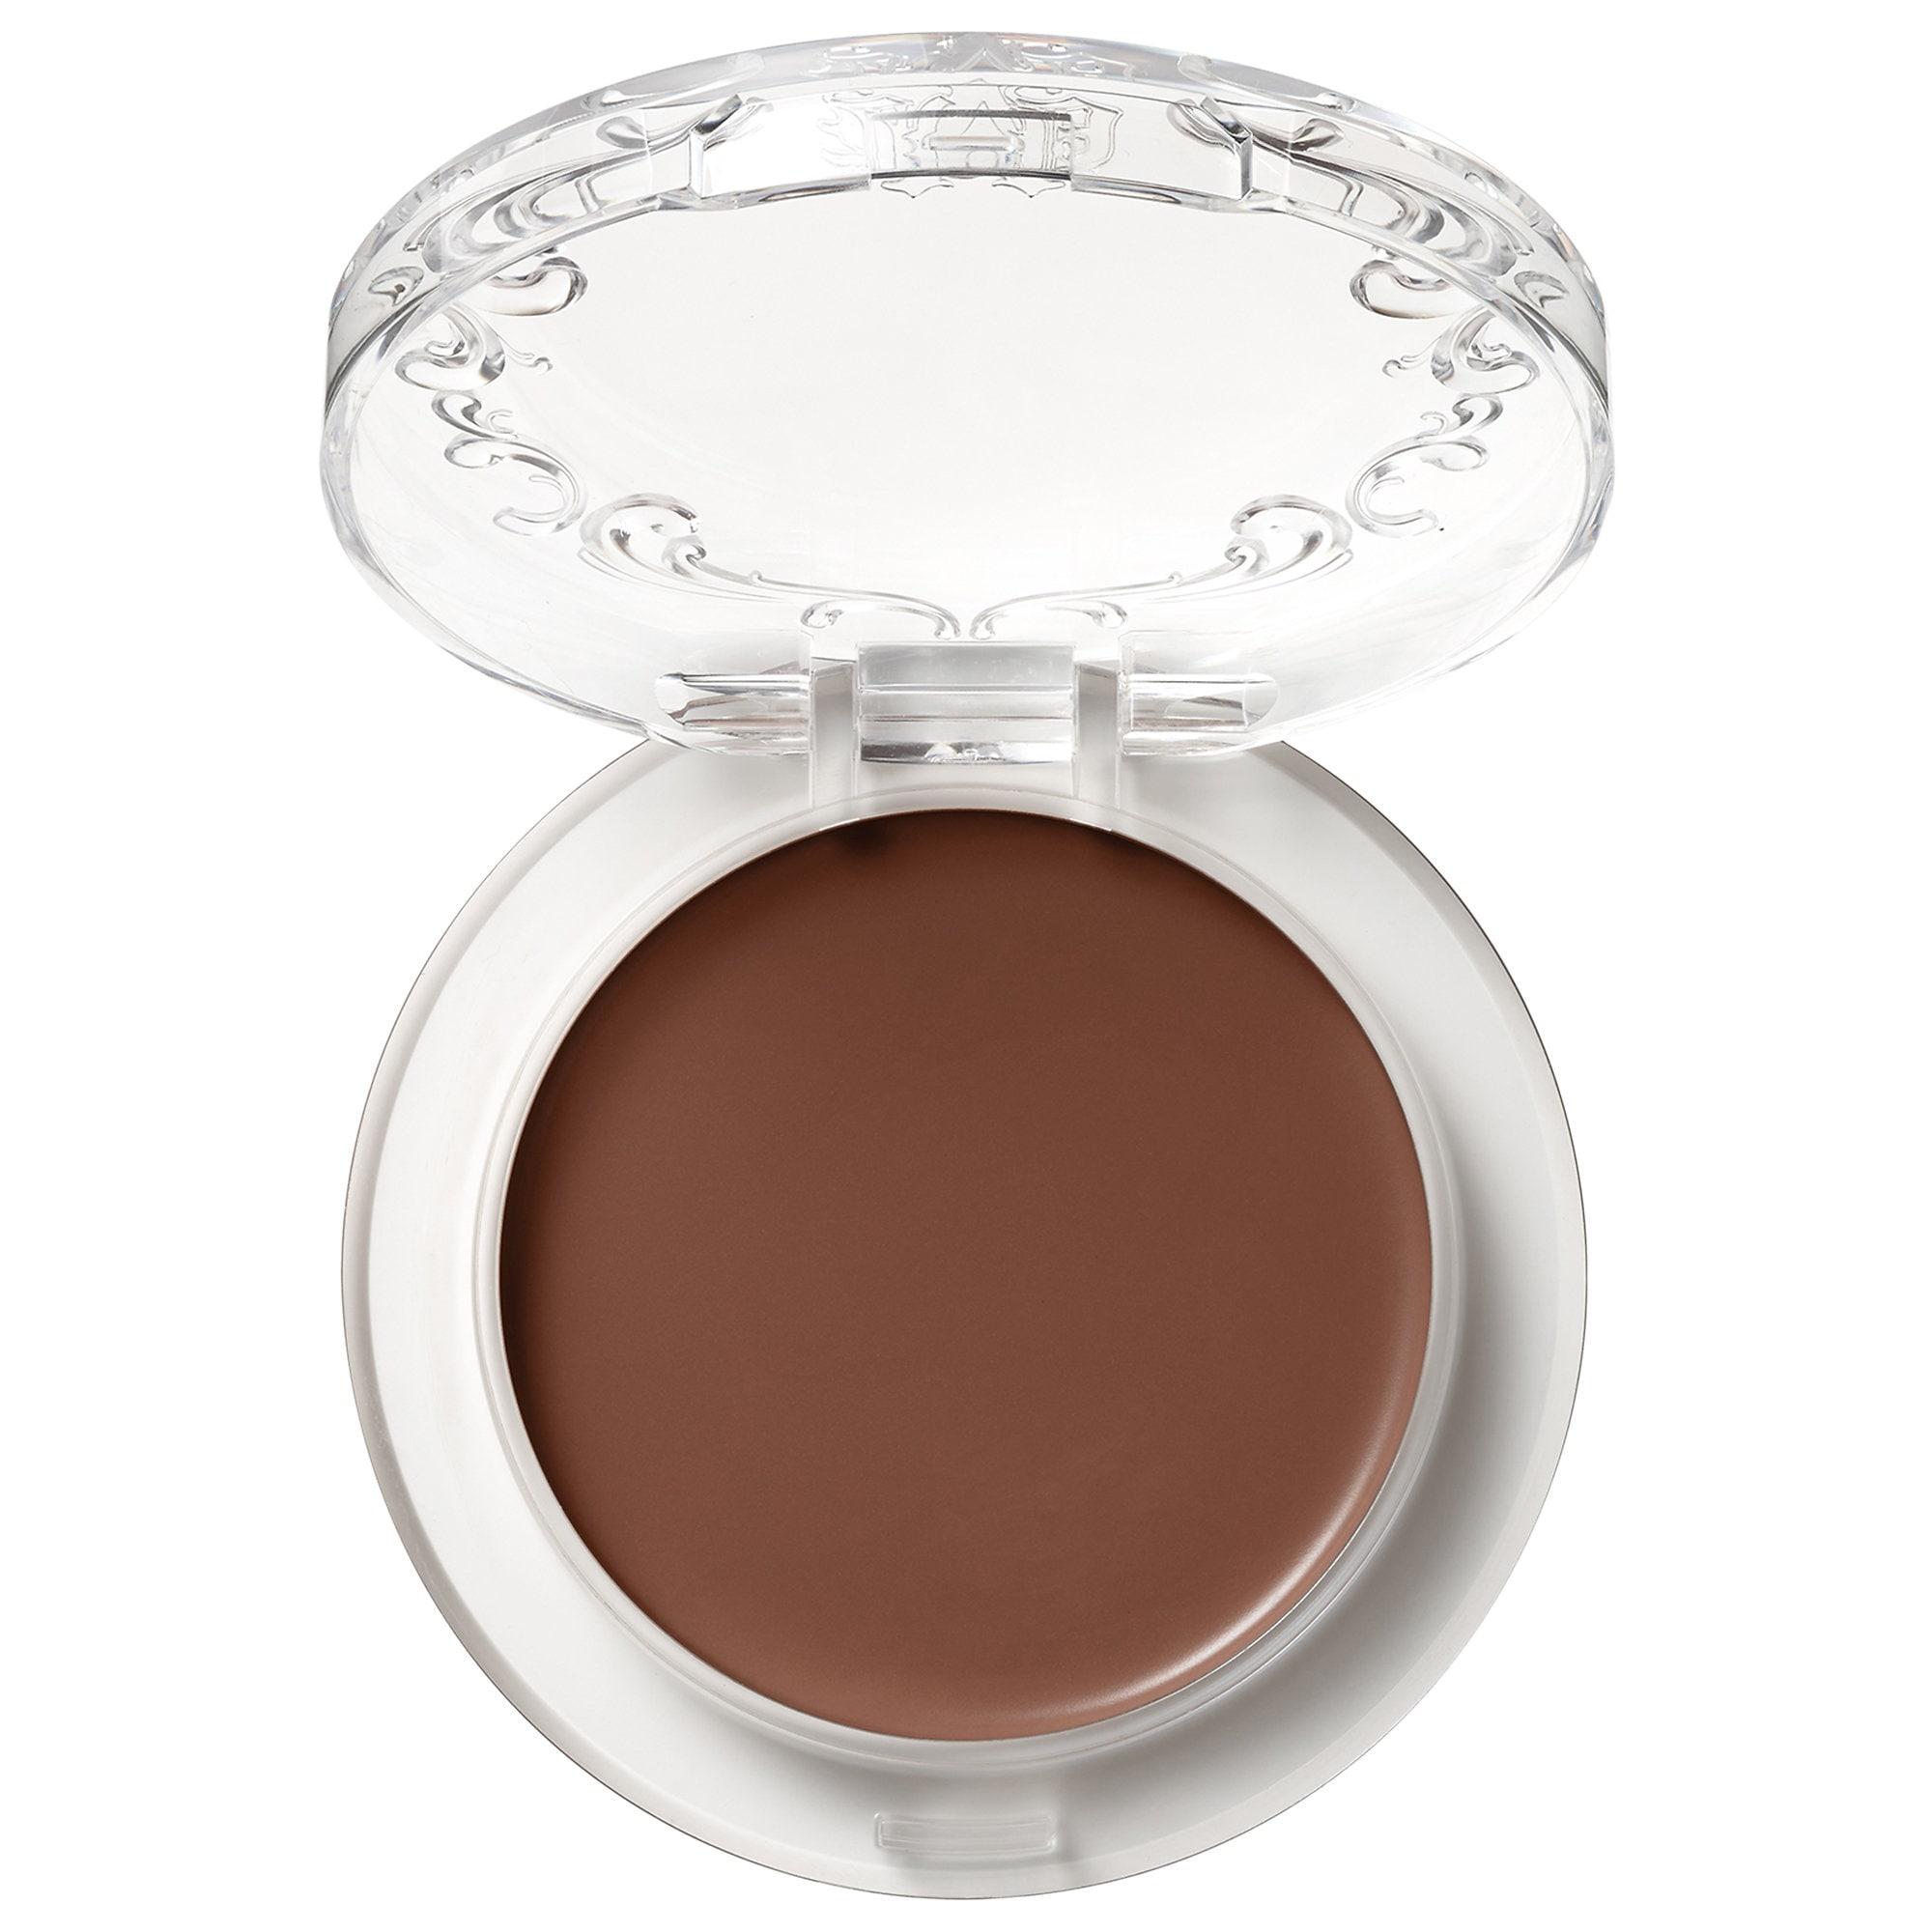 KVD Beauty Good Apple Skin-Perfecting Hydrating Foundation Balm